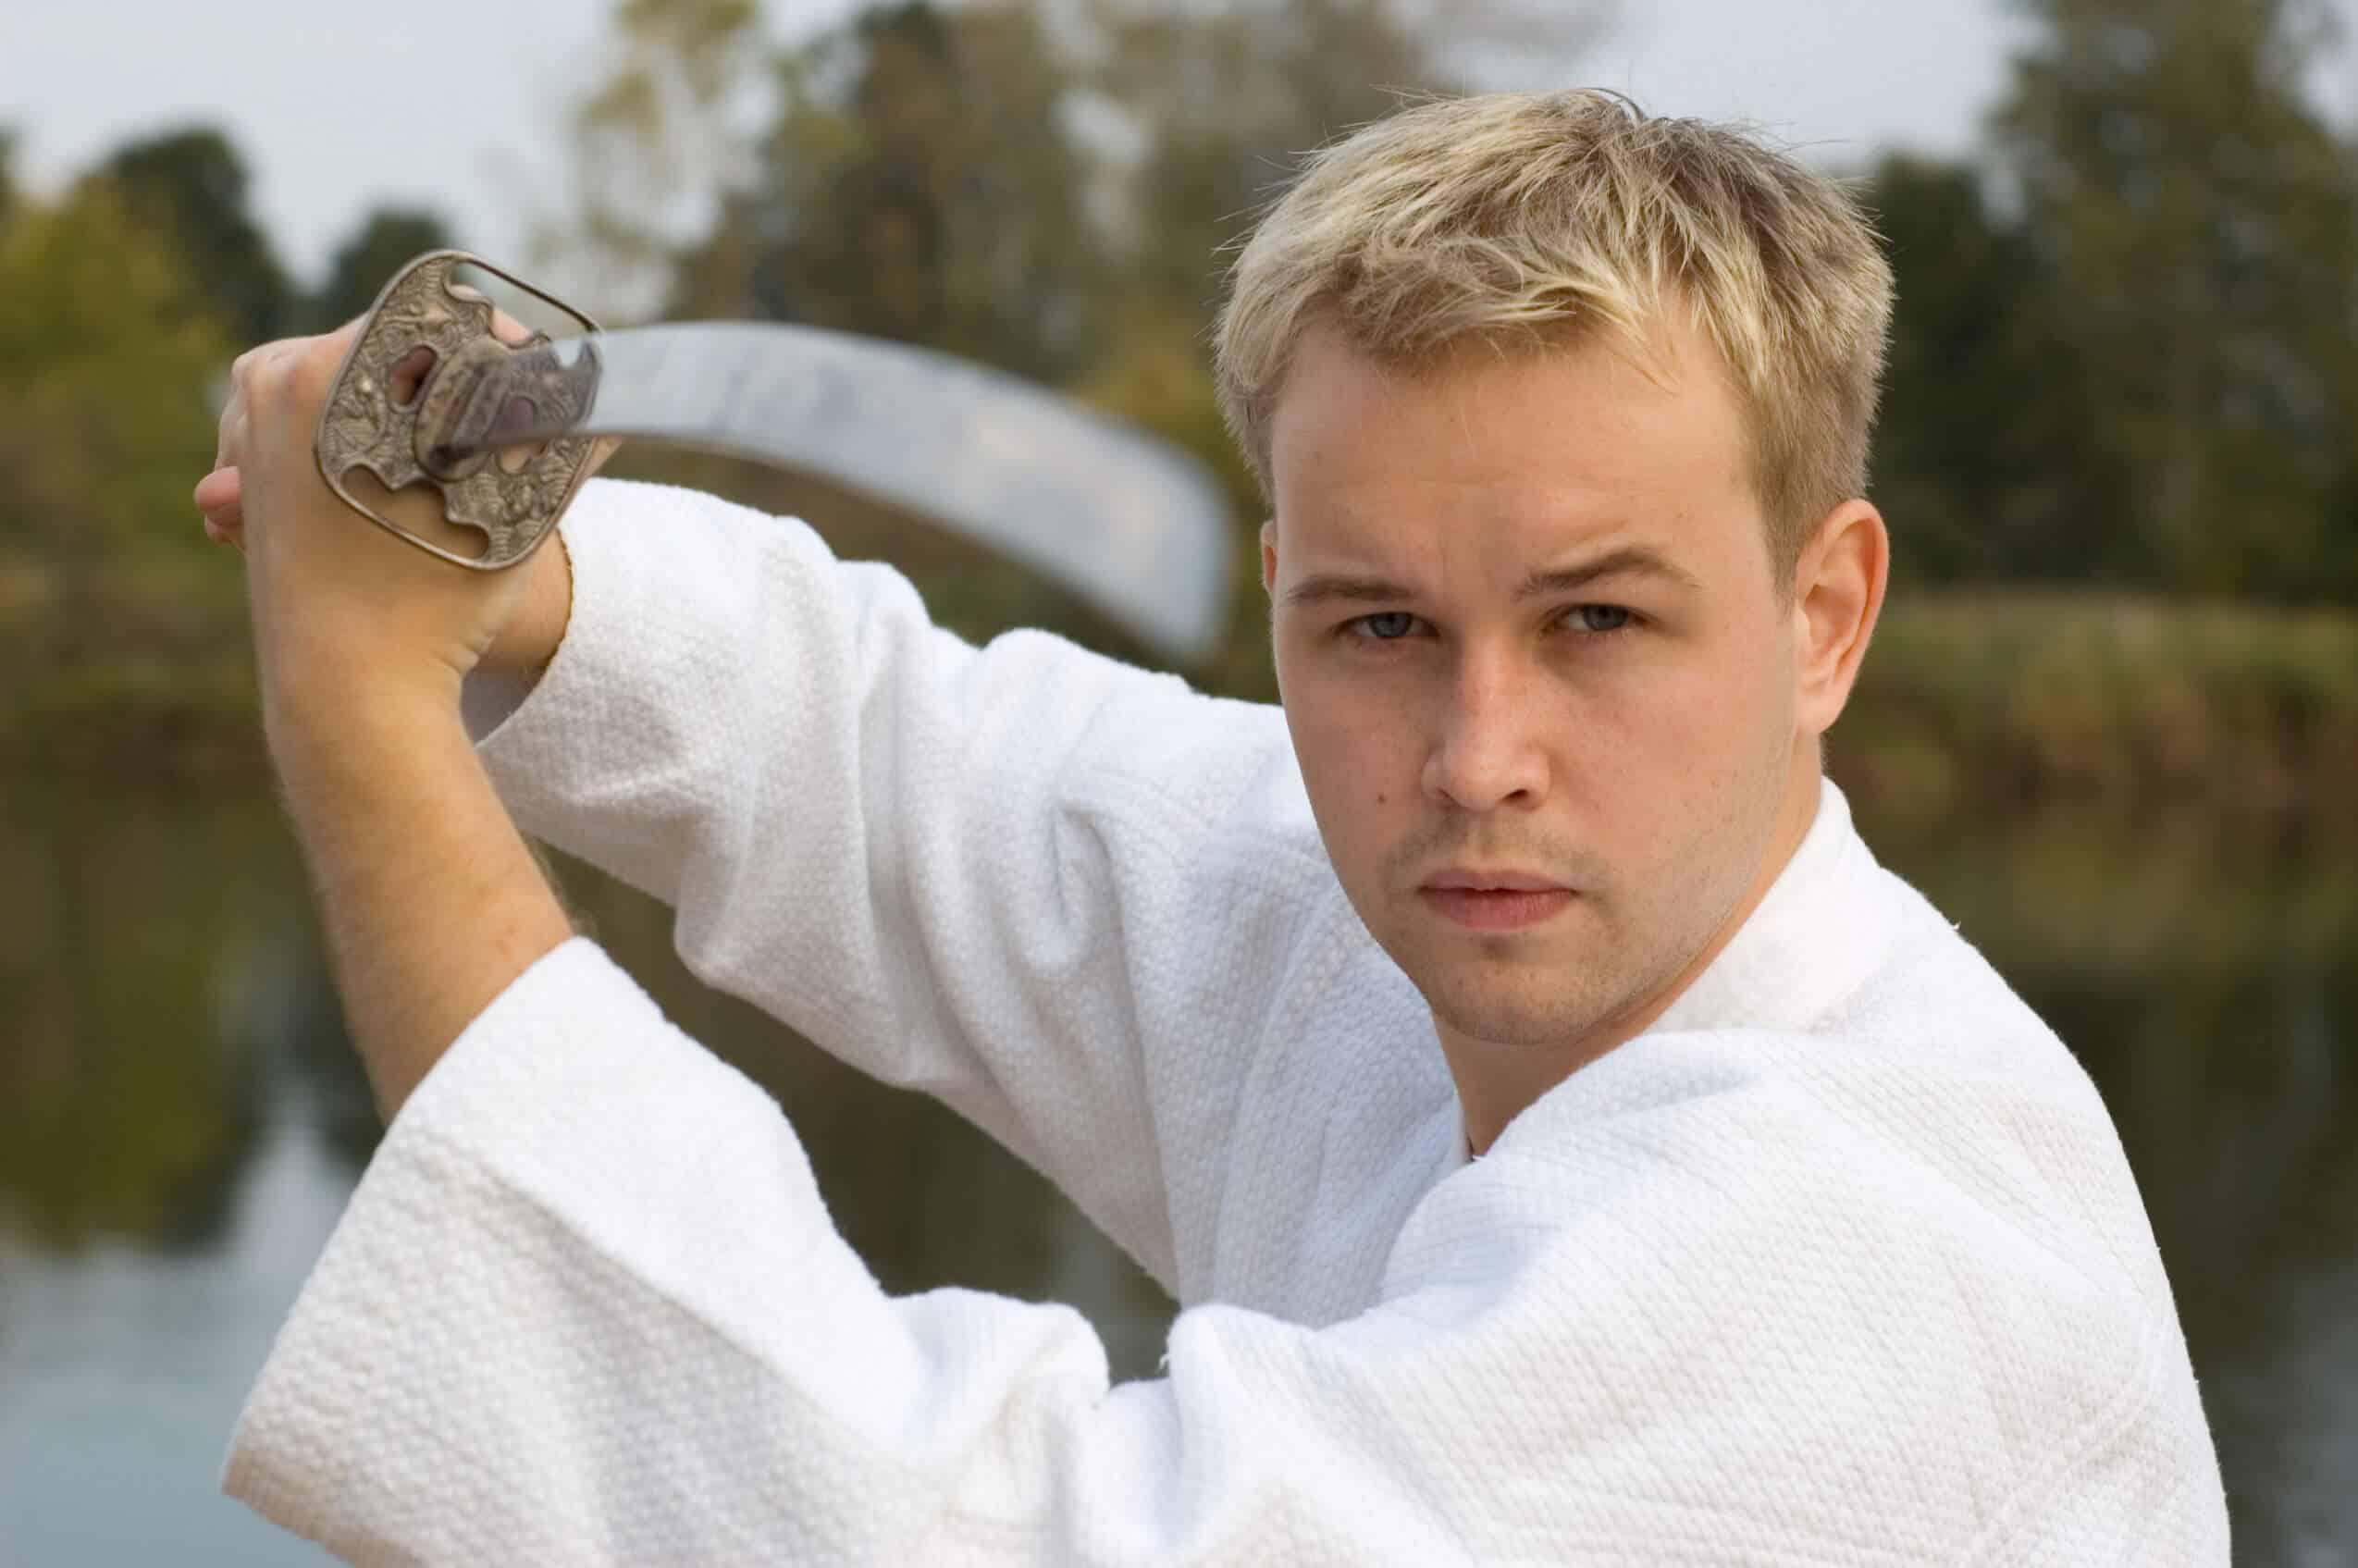 Martial Arts Lessons for Adults in Bossier City LA - Samurai Sword Posing Blog